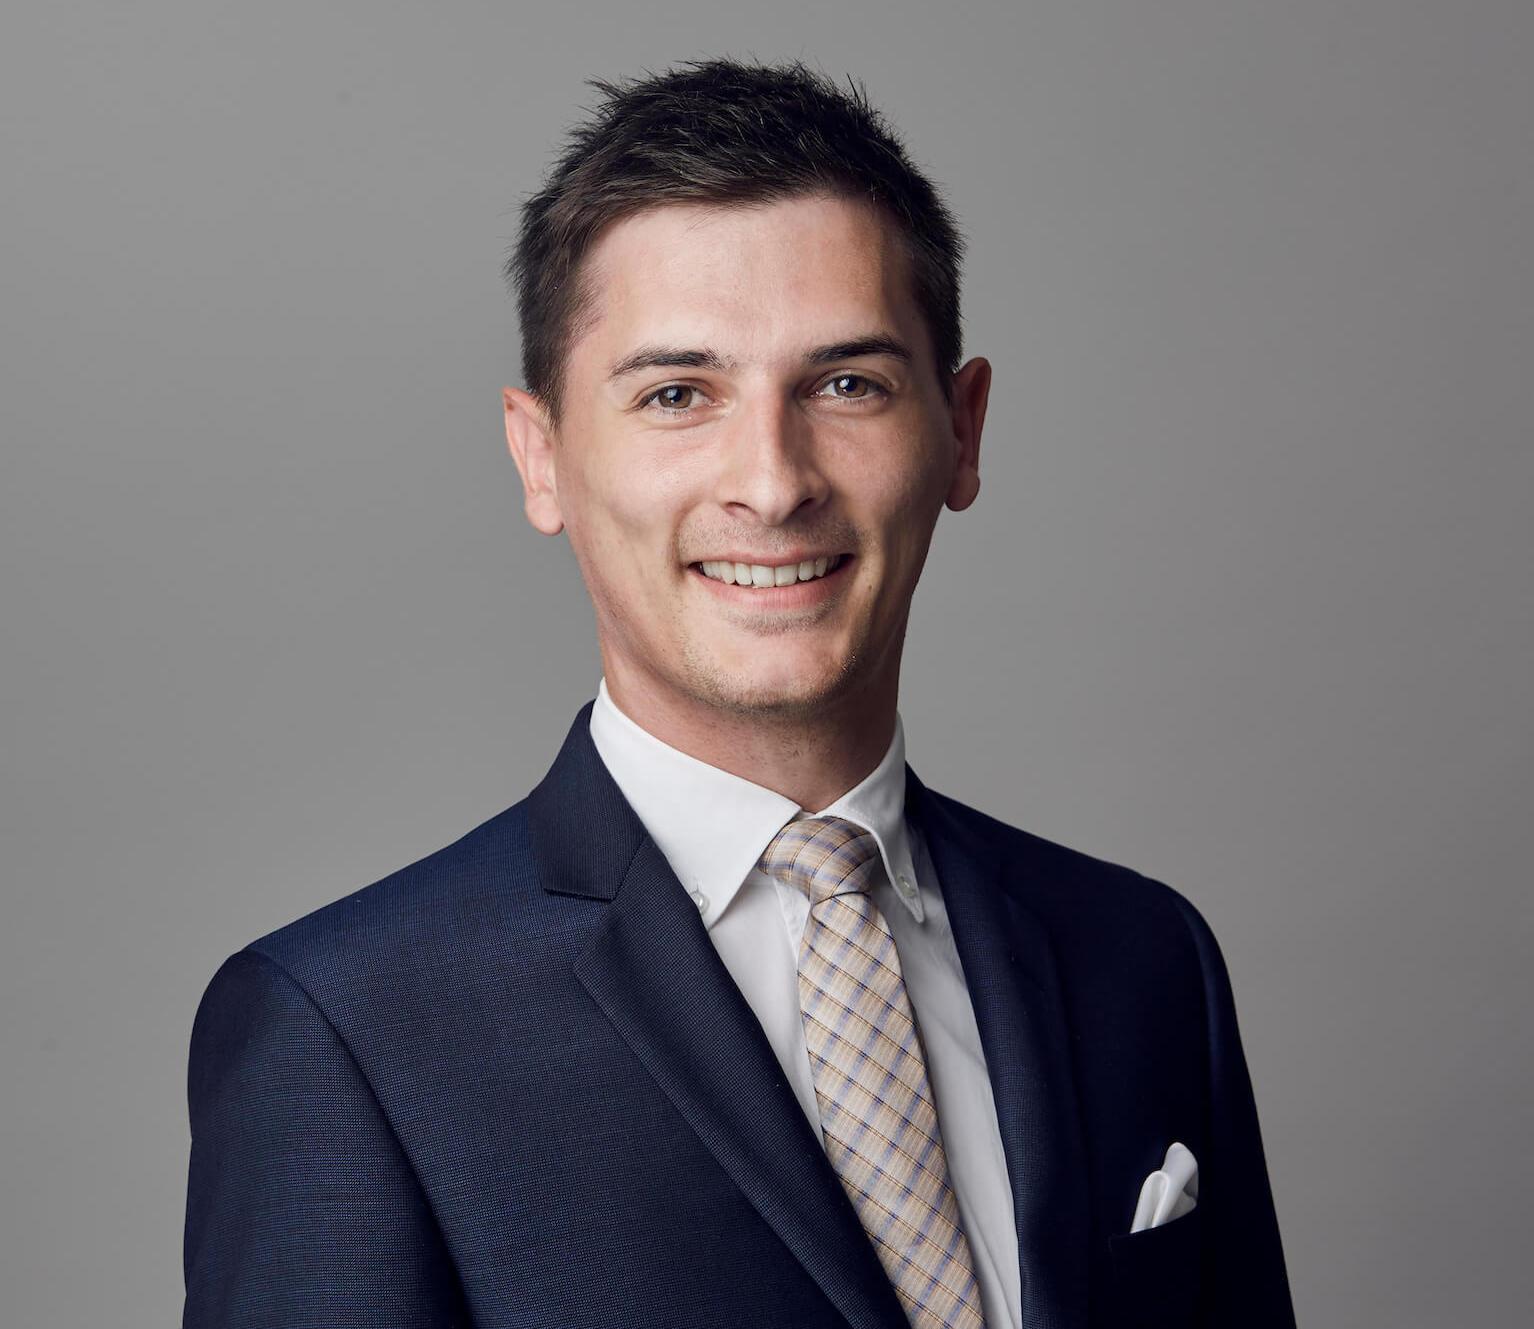 Matthias Schoell